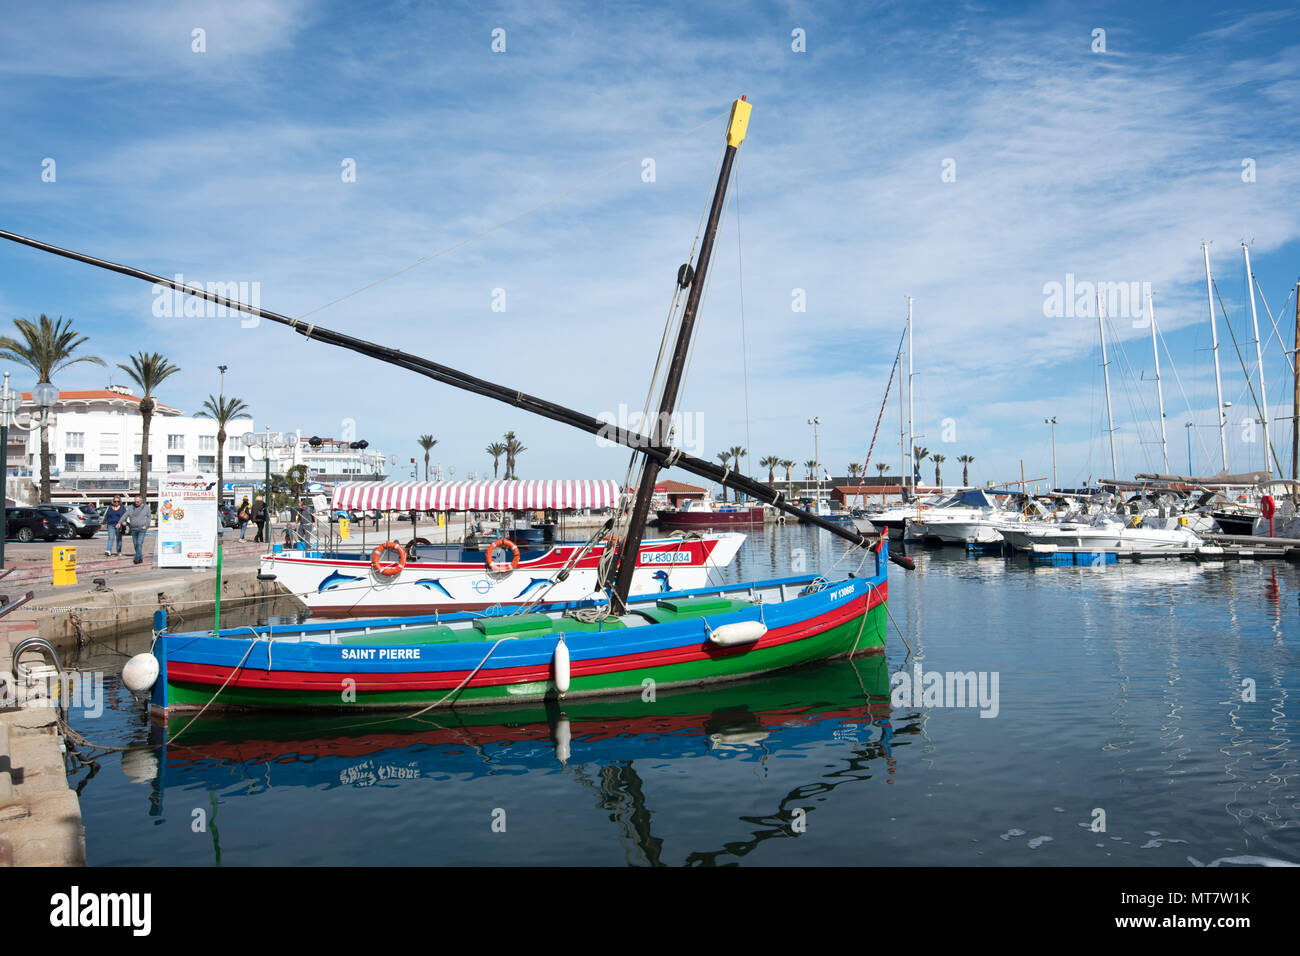 Traditional Barque Catalane Saint-Pierre in Saint-Cyprien Plage harbour, Roussillon, Pyrenees-Orientales, France - Stock Image